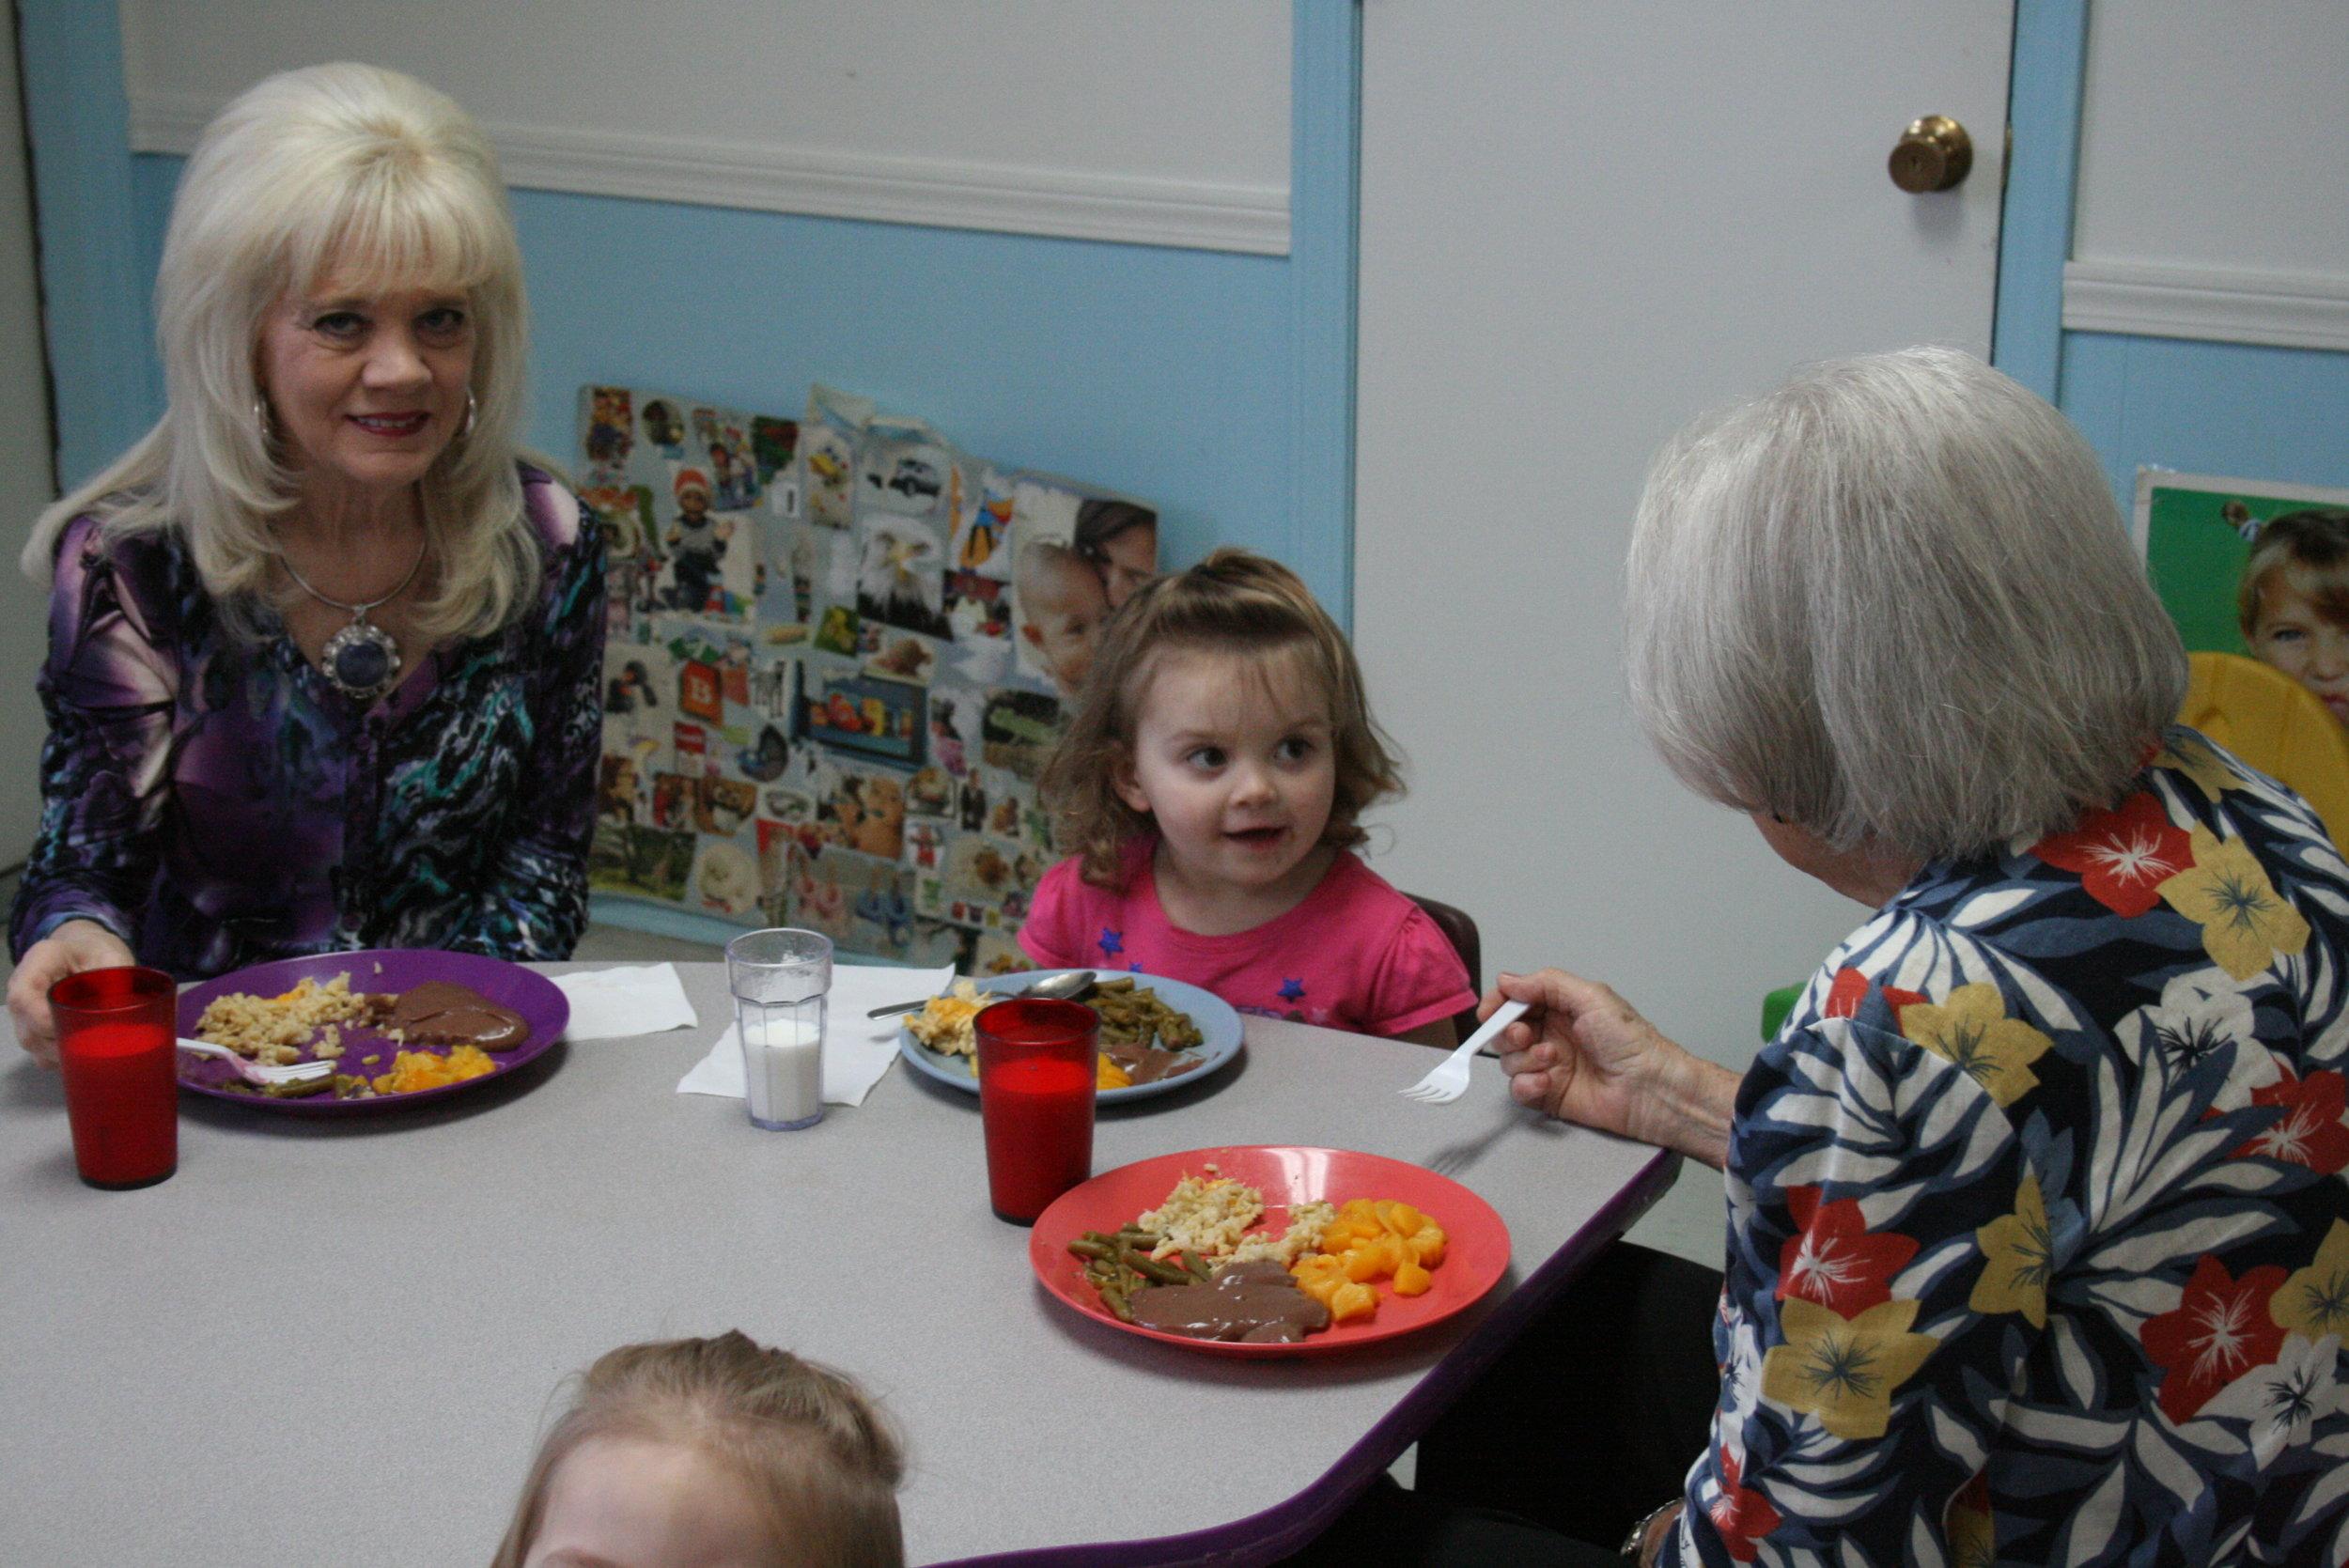 grandparents lunch 9-8-17 006.JPG